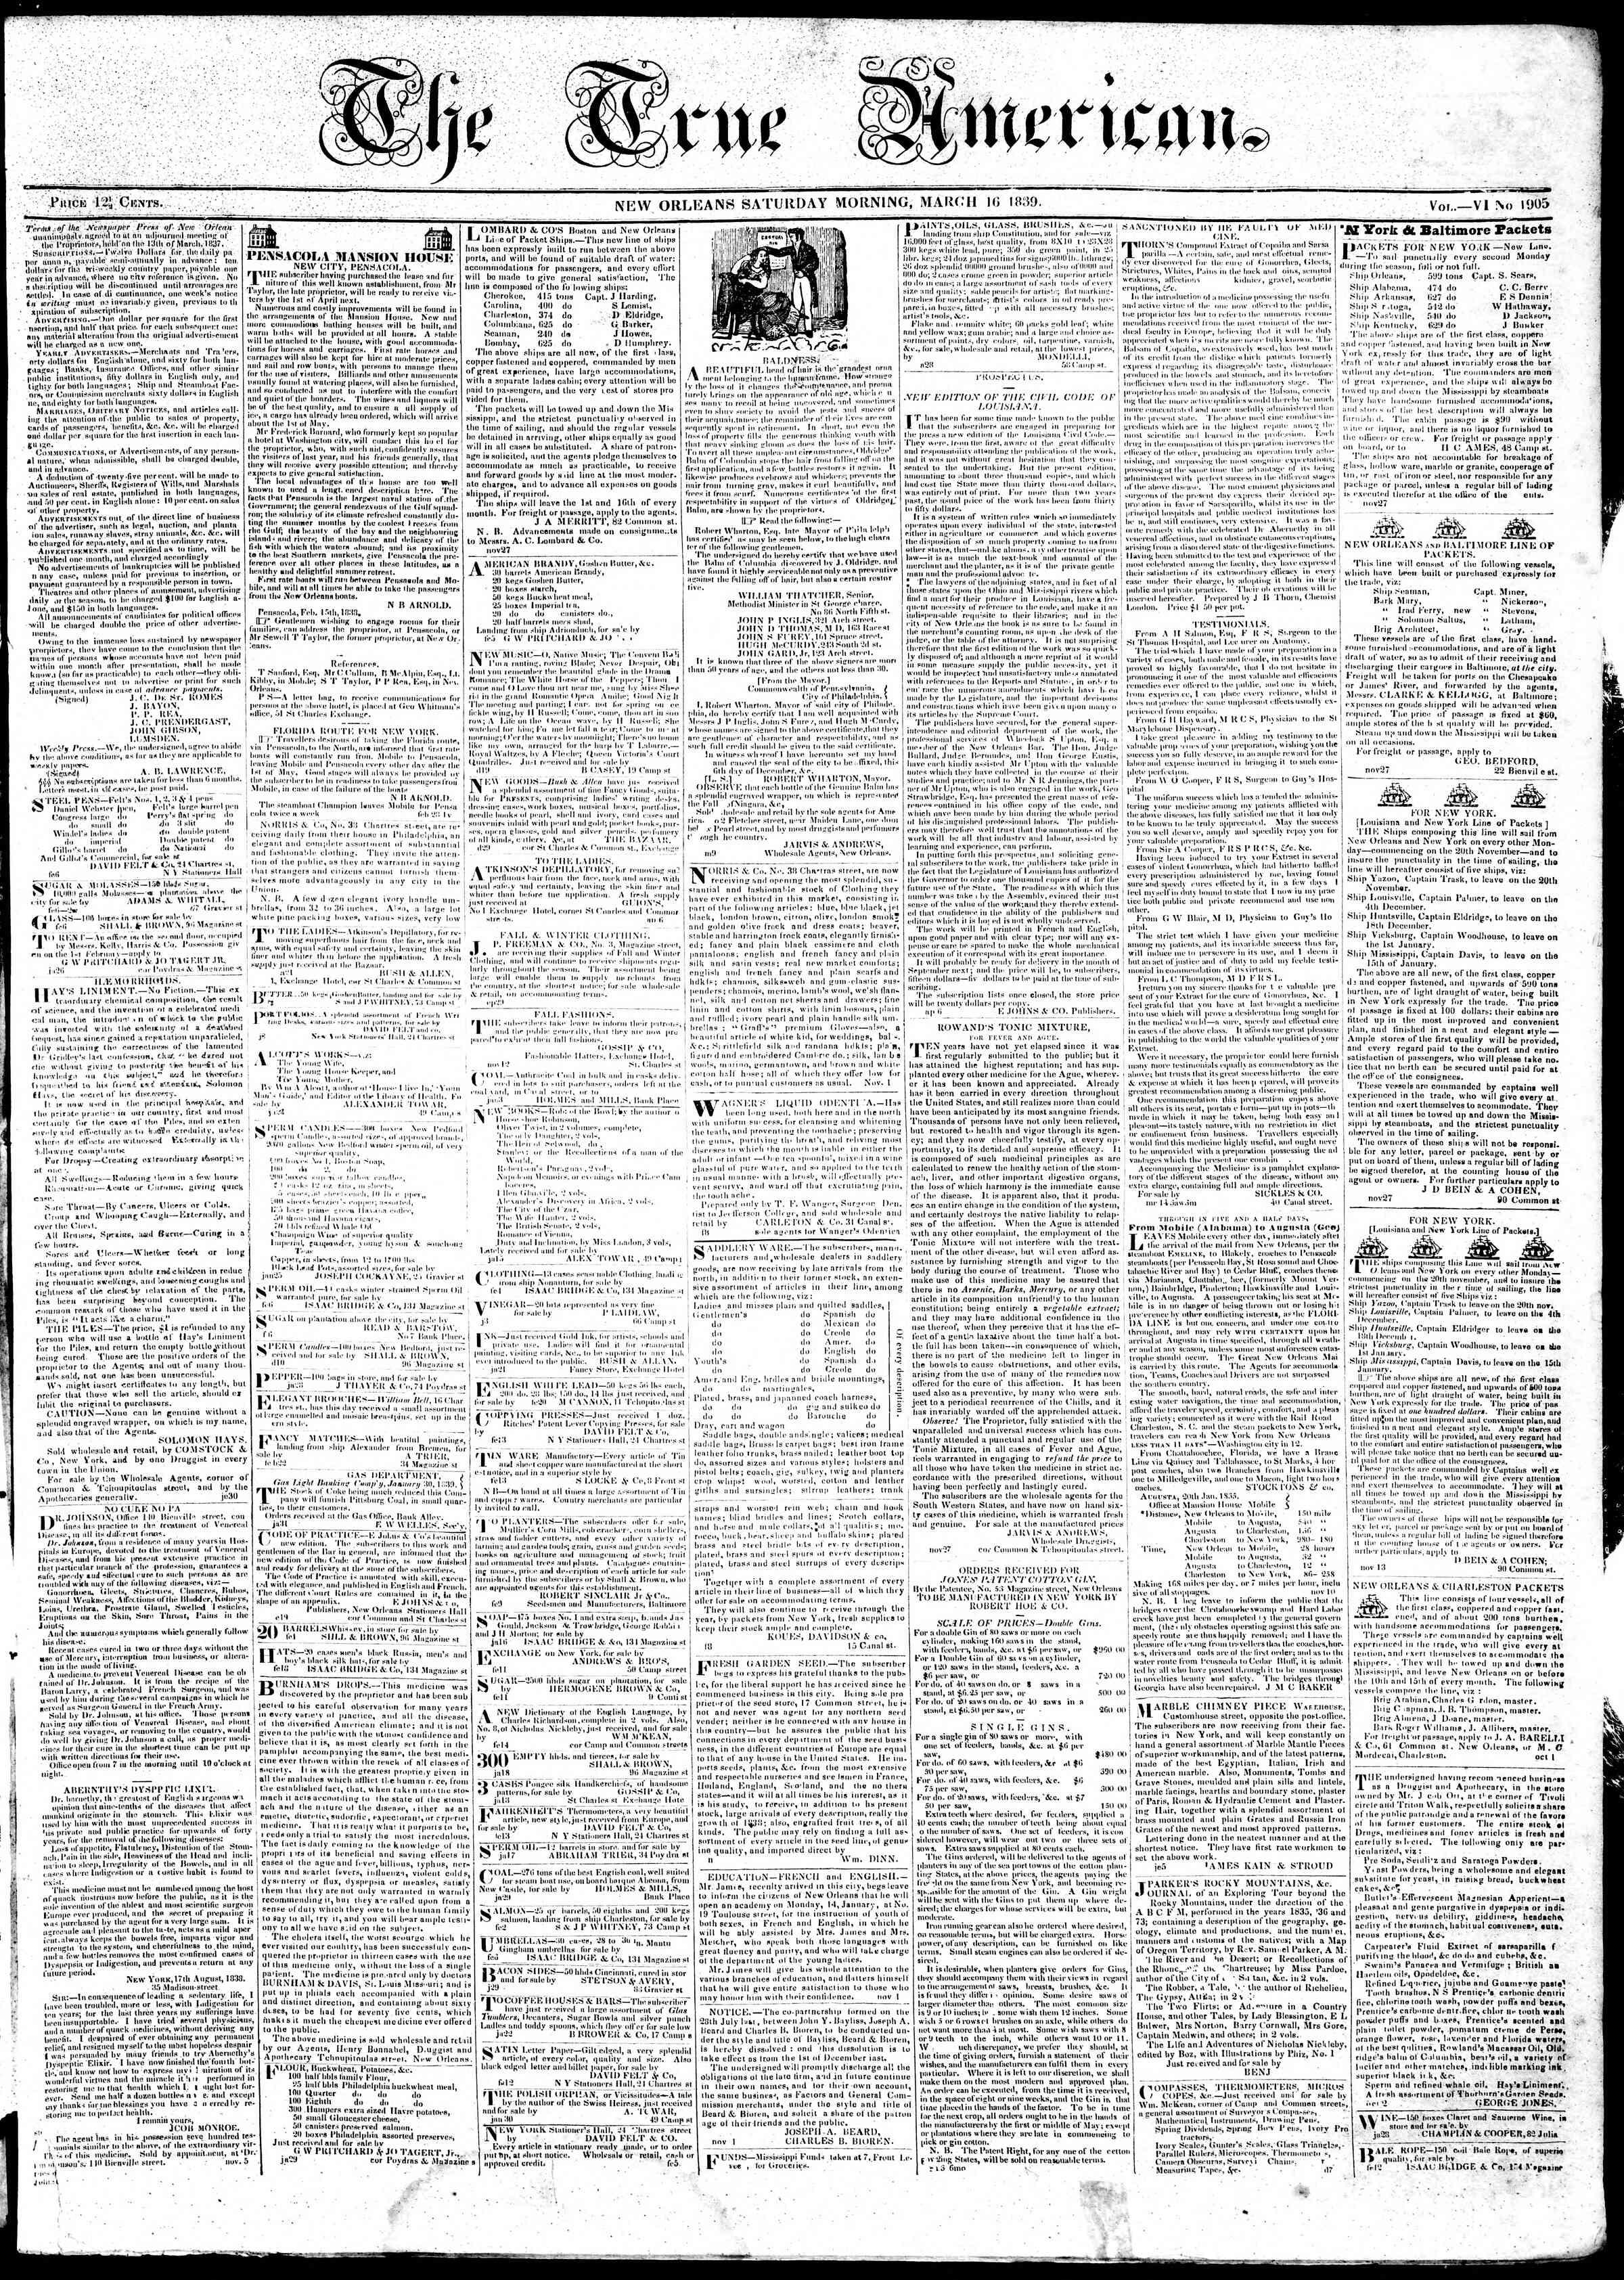 March 16, 1839 Tarihli True American Gazetesi Sayfa 1